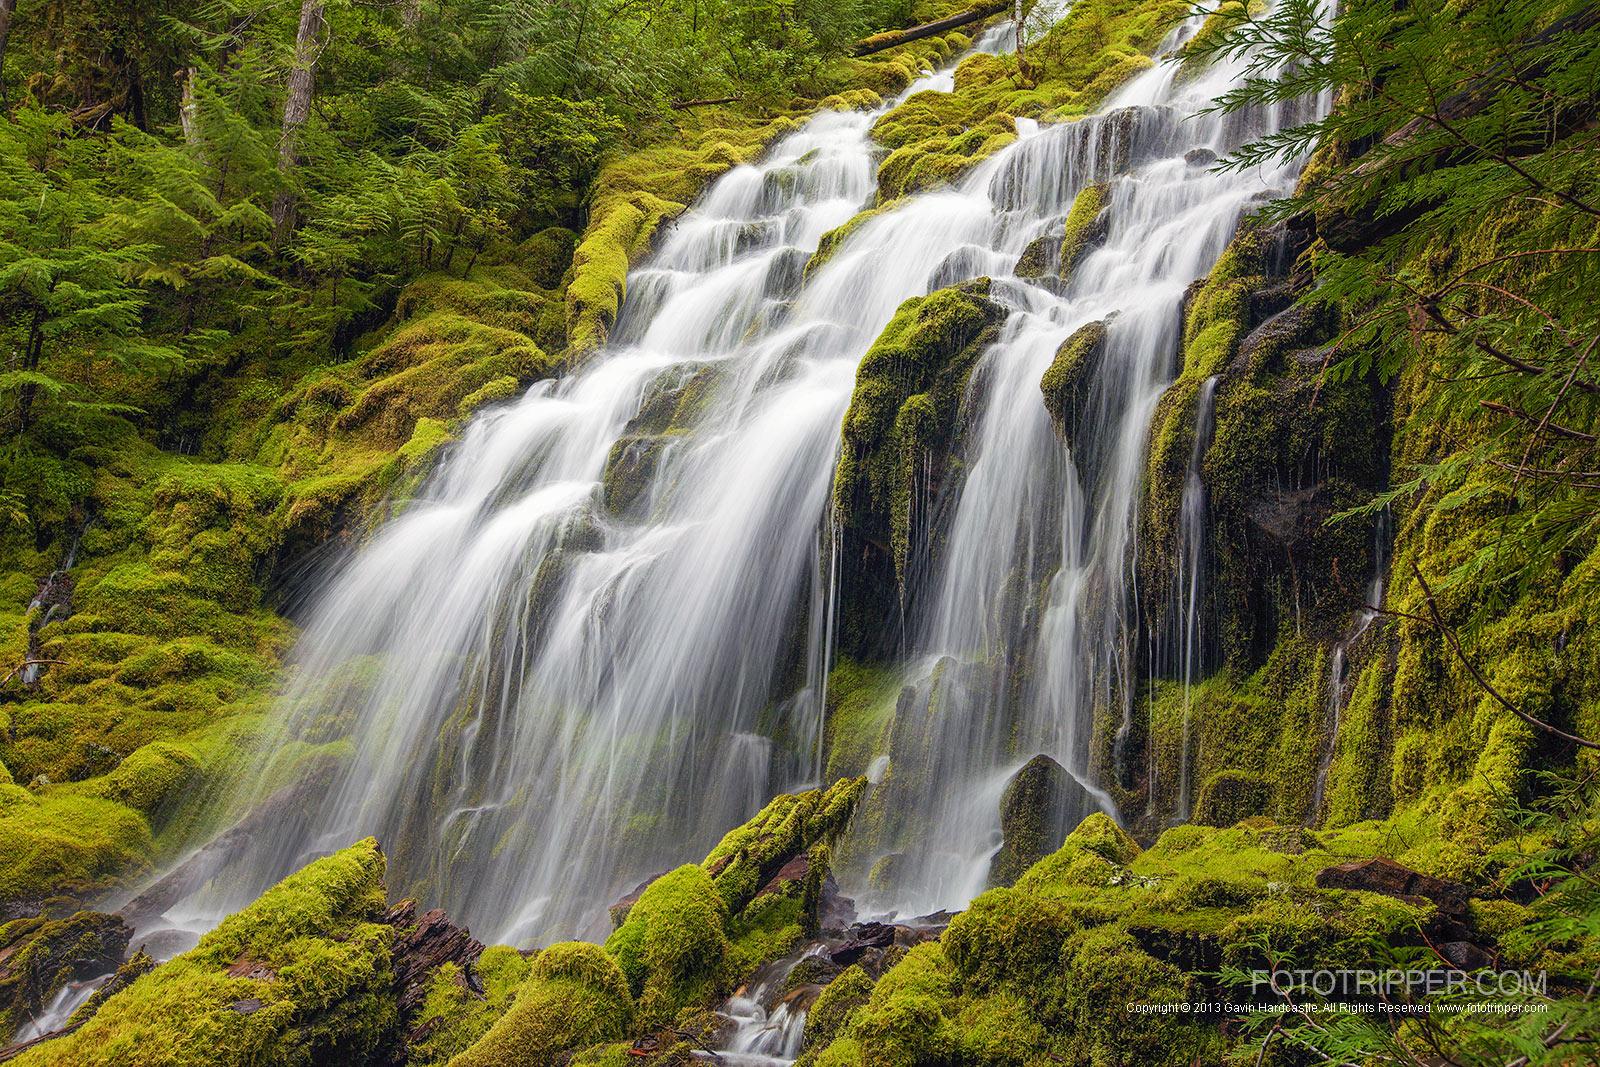 Upper Proxy Falls Photo Tips